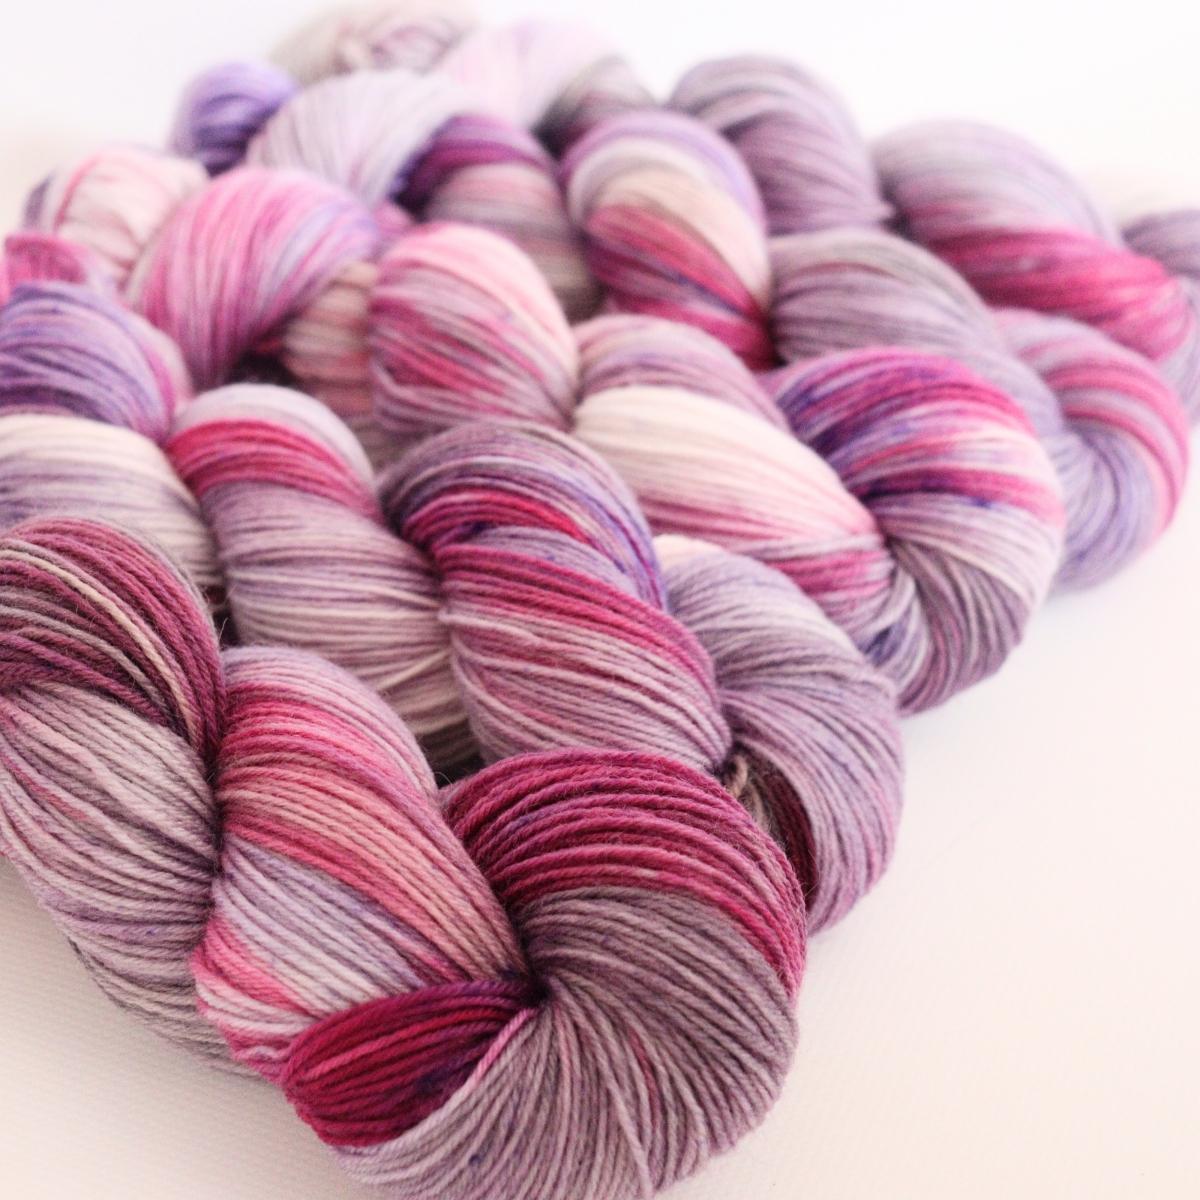 woodico.pro hand dyed yarn 059 1200x1200 - Hand dyed yarn / 059